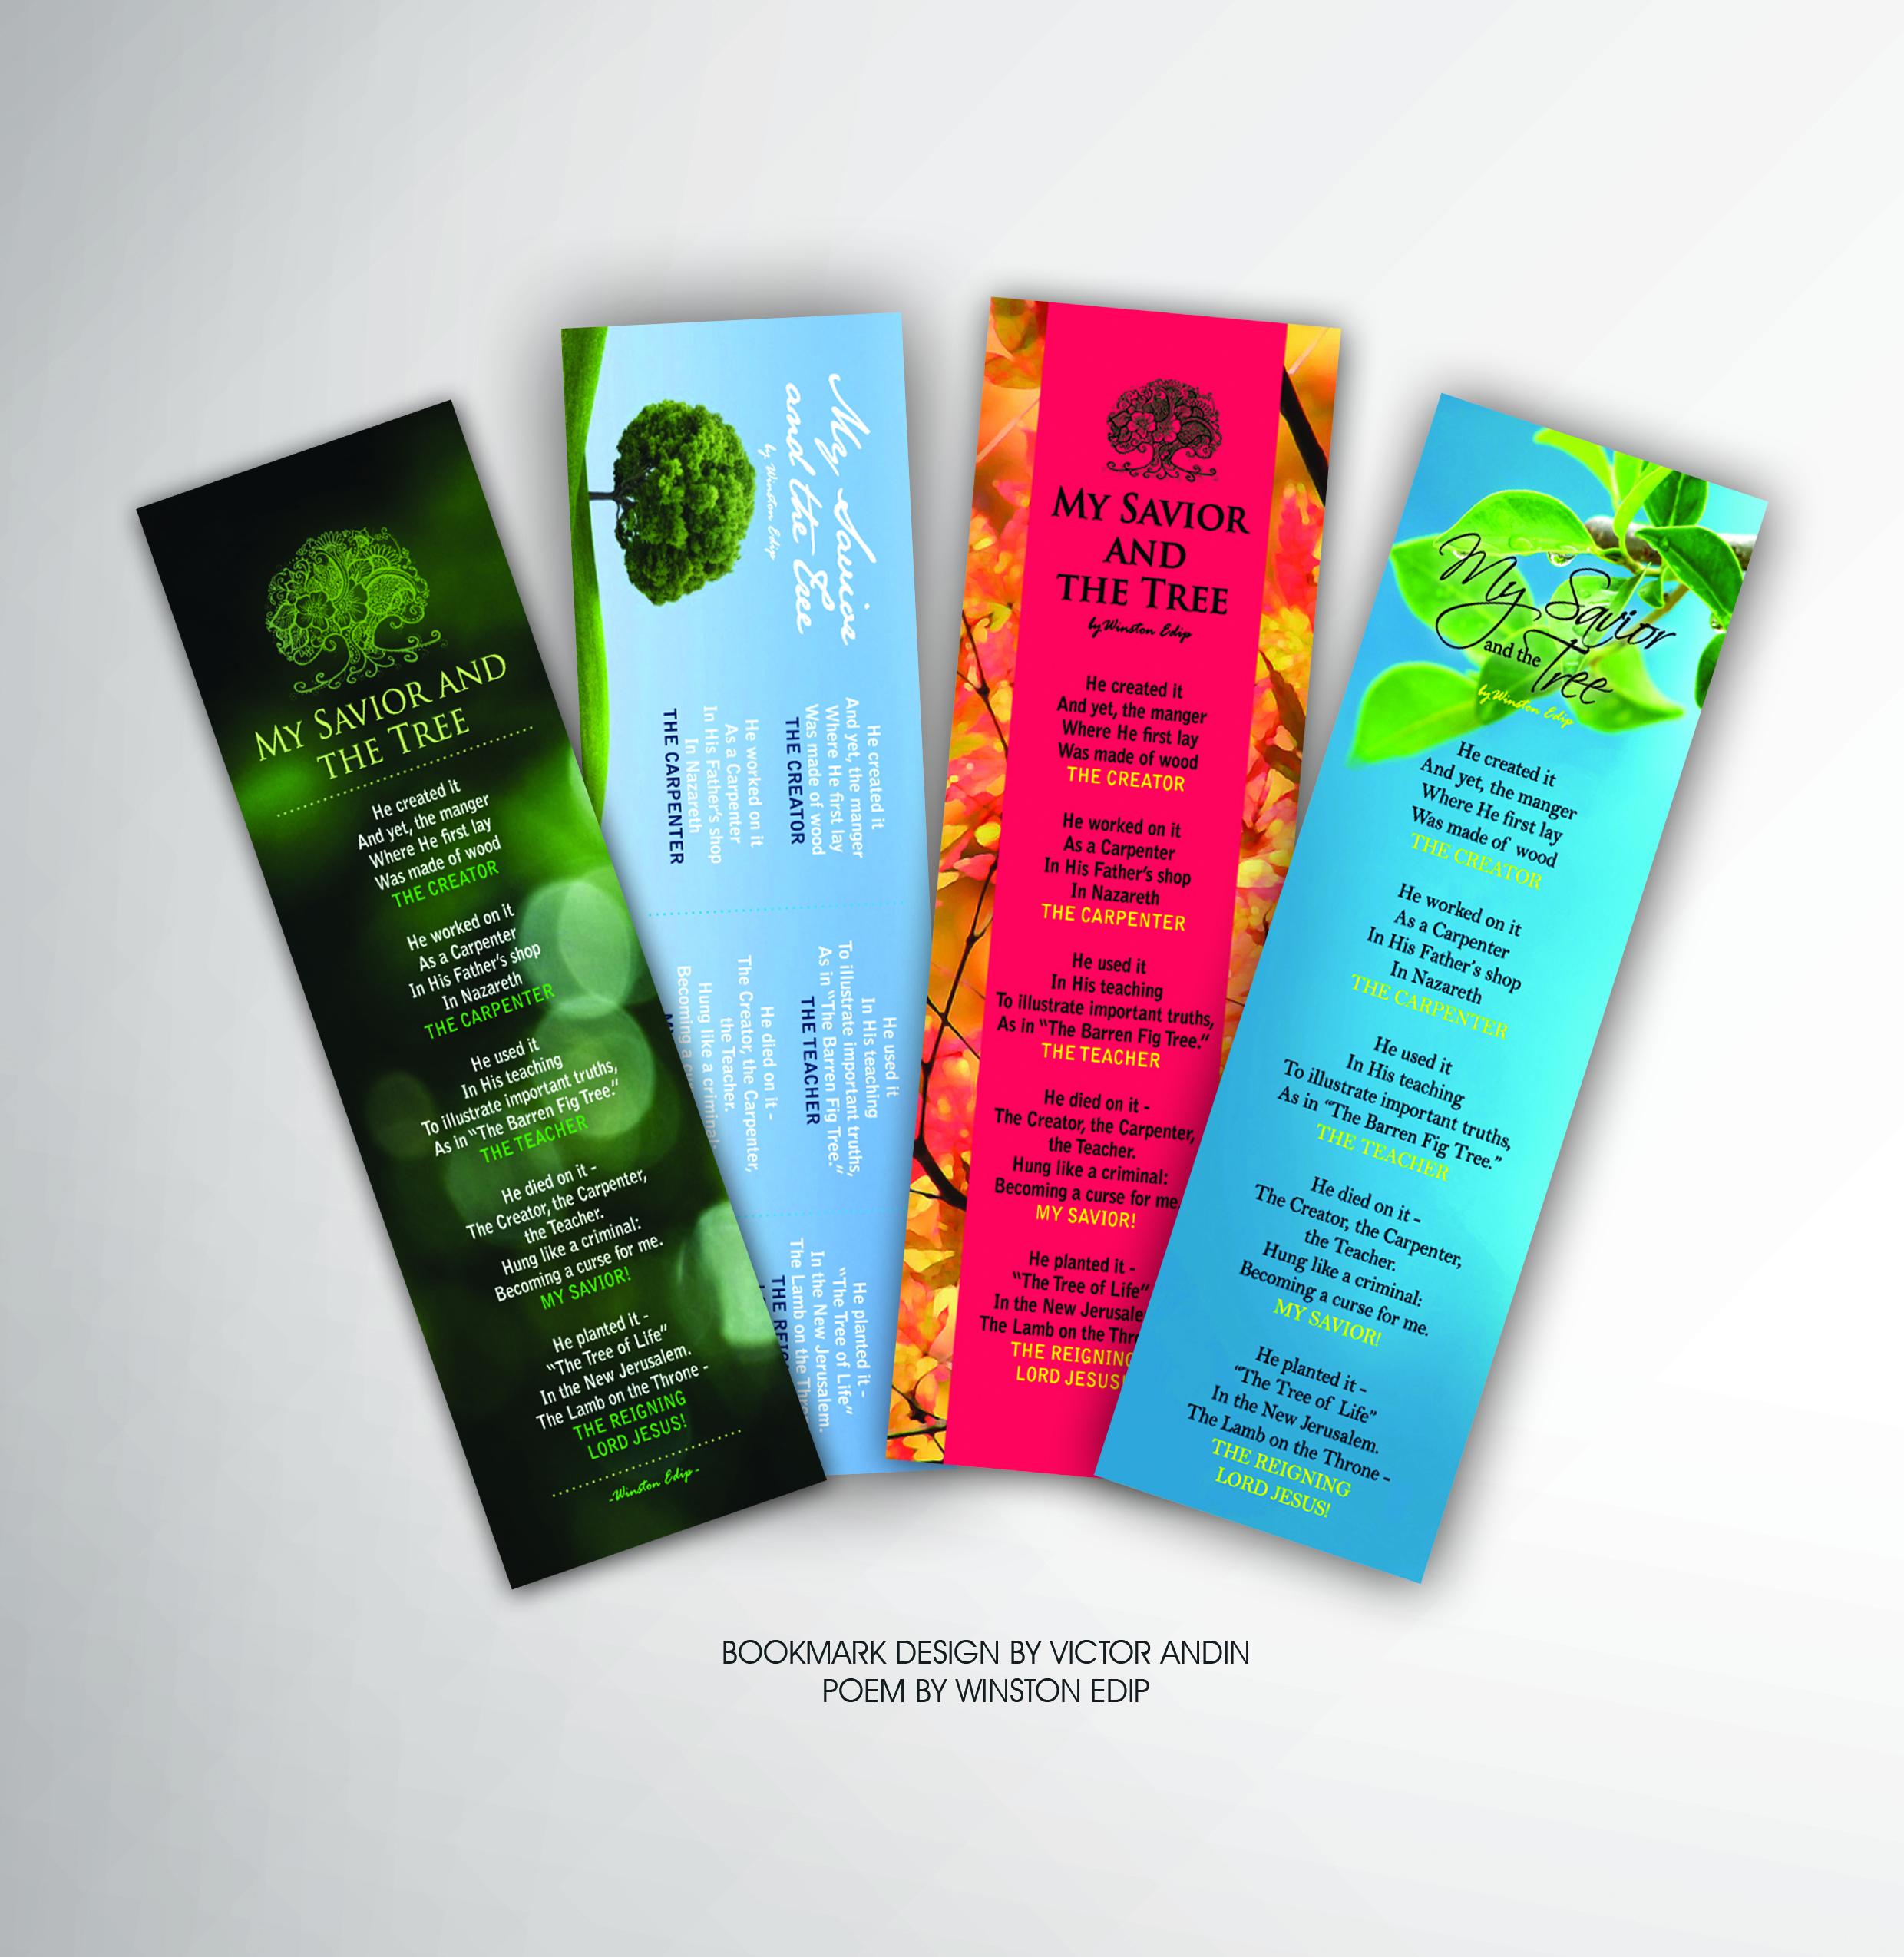 Bookmark Design | victor andin design